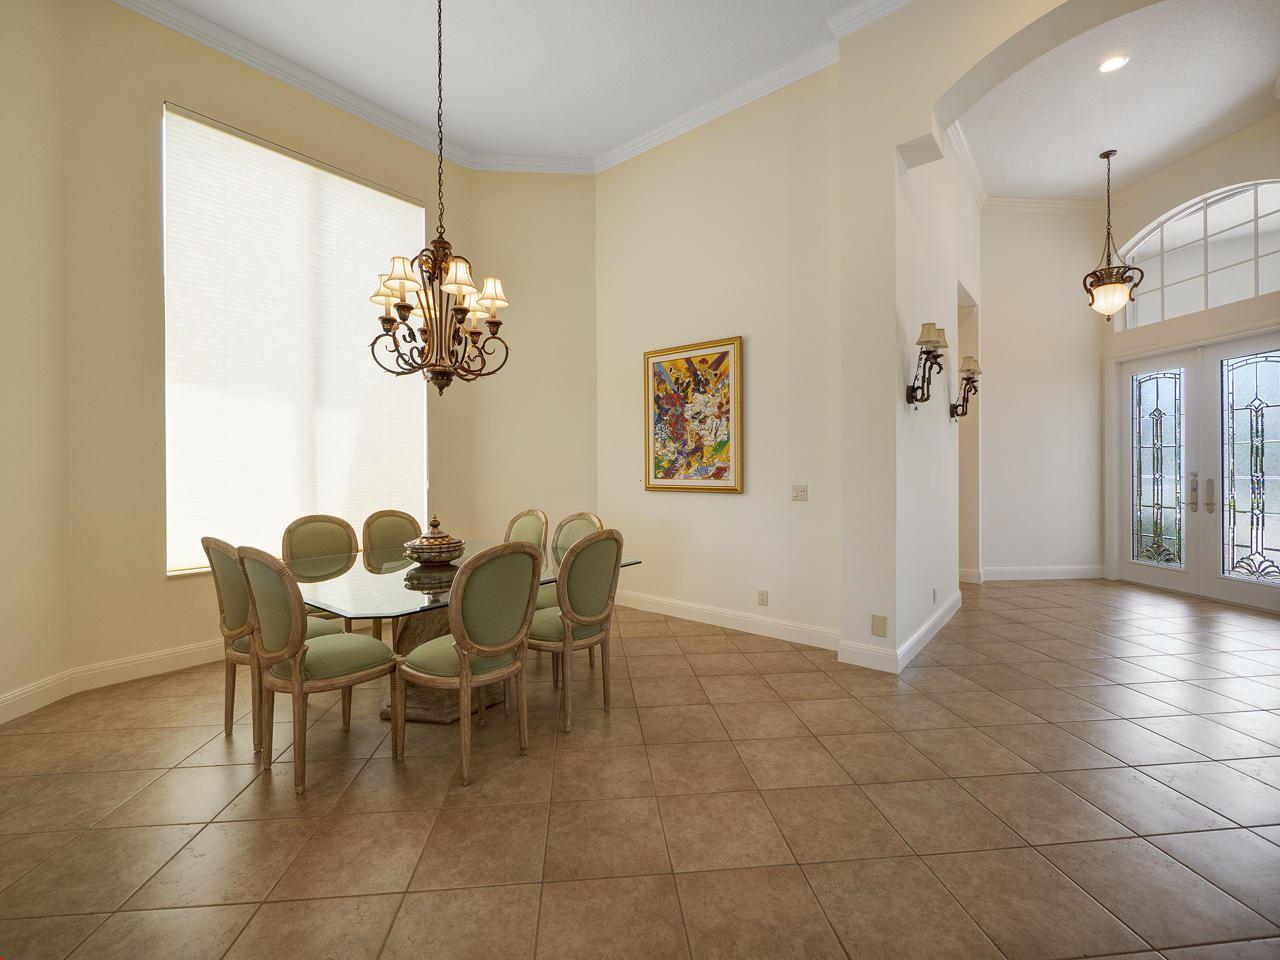 Photo of 141 San Marco Drive, Palm Beach Gardens, FL 33418 (MLS # RX-10584309)